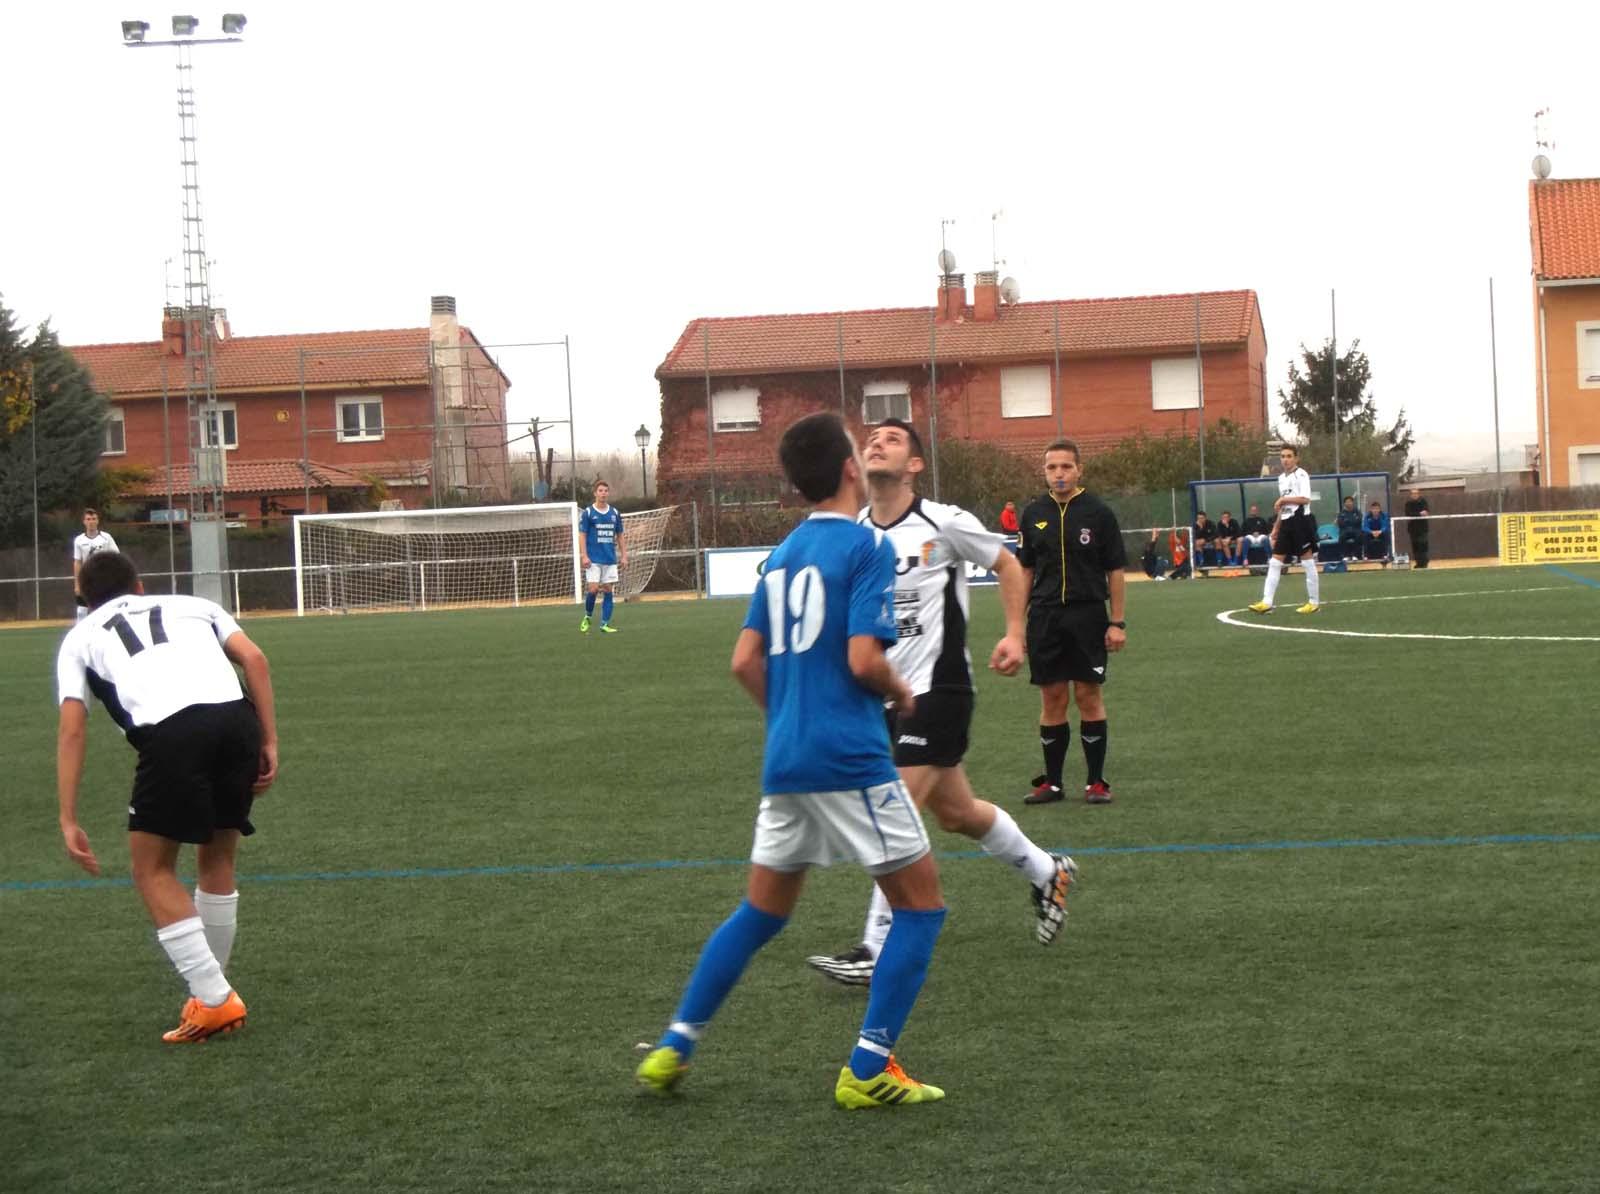 Al Yunquera le costó mucho doblegar al Villanueva de la Torre (3-0)